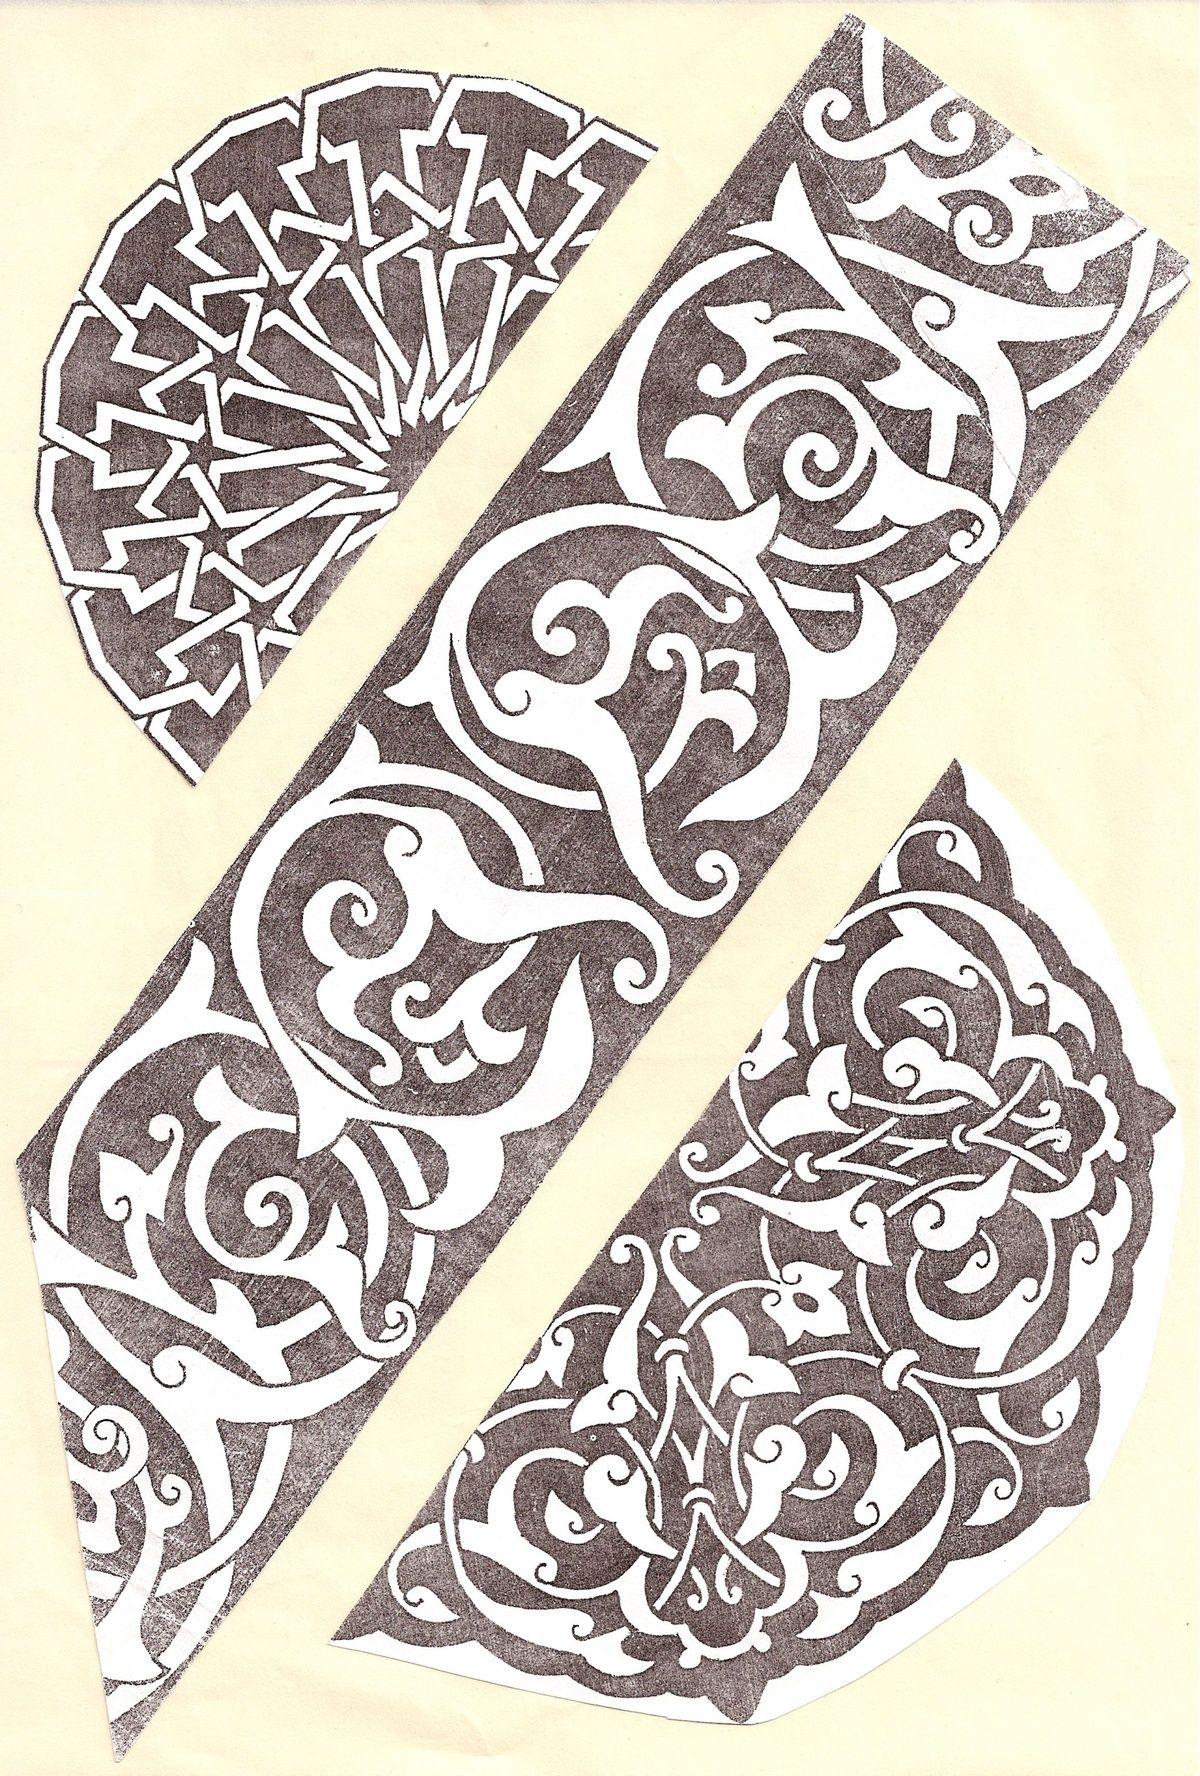 Afaddcceacbdbaefcajpg Pixel Design - Carved wood lace like lighting design inspired islamic decoration patterns